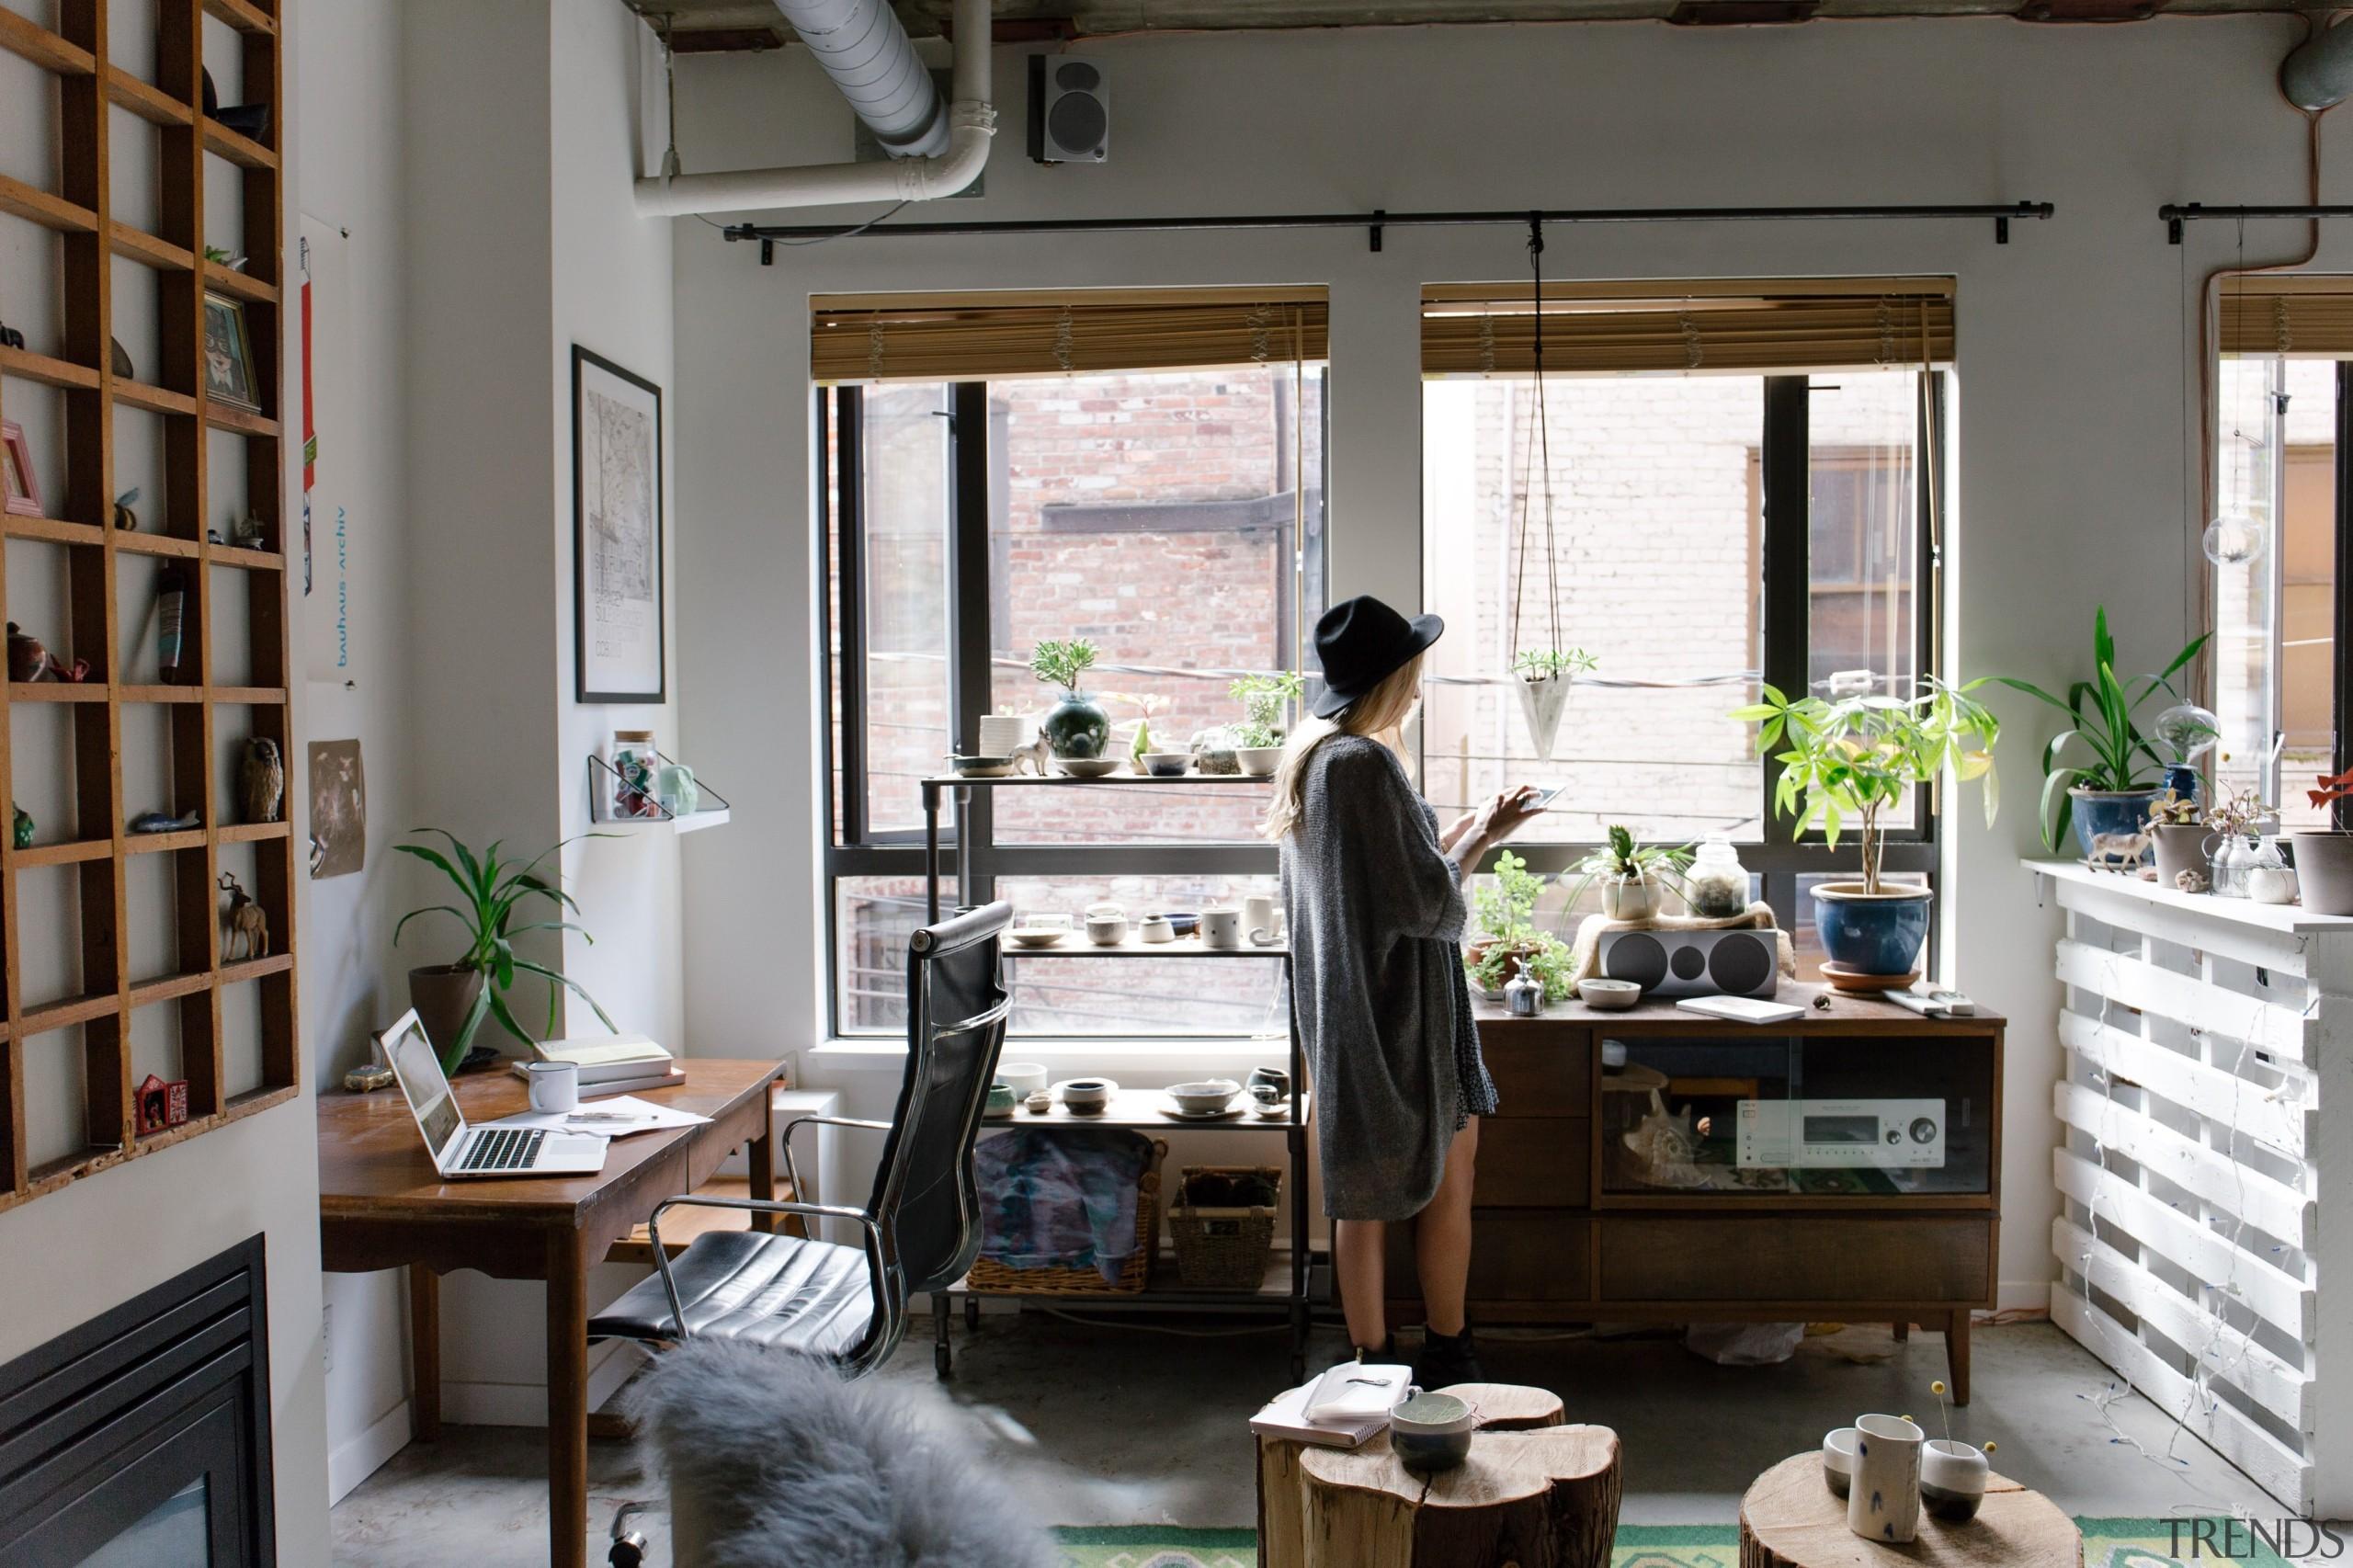 Bench Accounting – Unsplash - furniture   interior furniture, interior design, shelving, window, gray, black